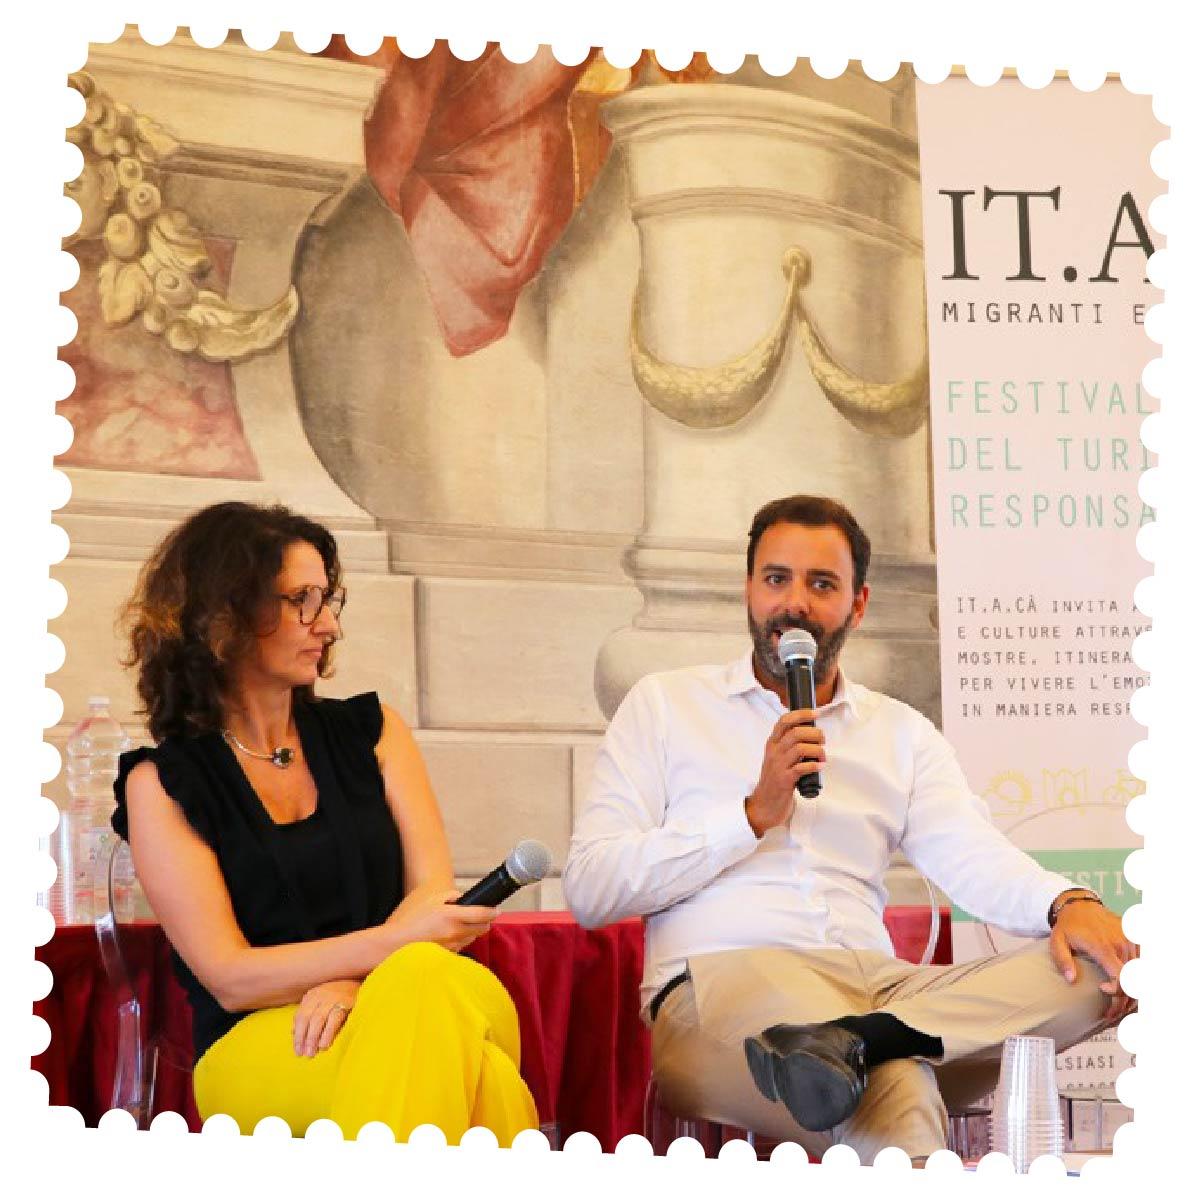 festival-itaca-strategia-eventi-turismo-sostenibile-sponsor-ravenna-5